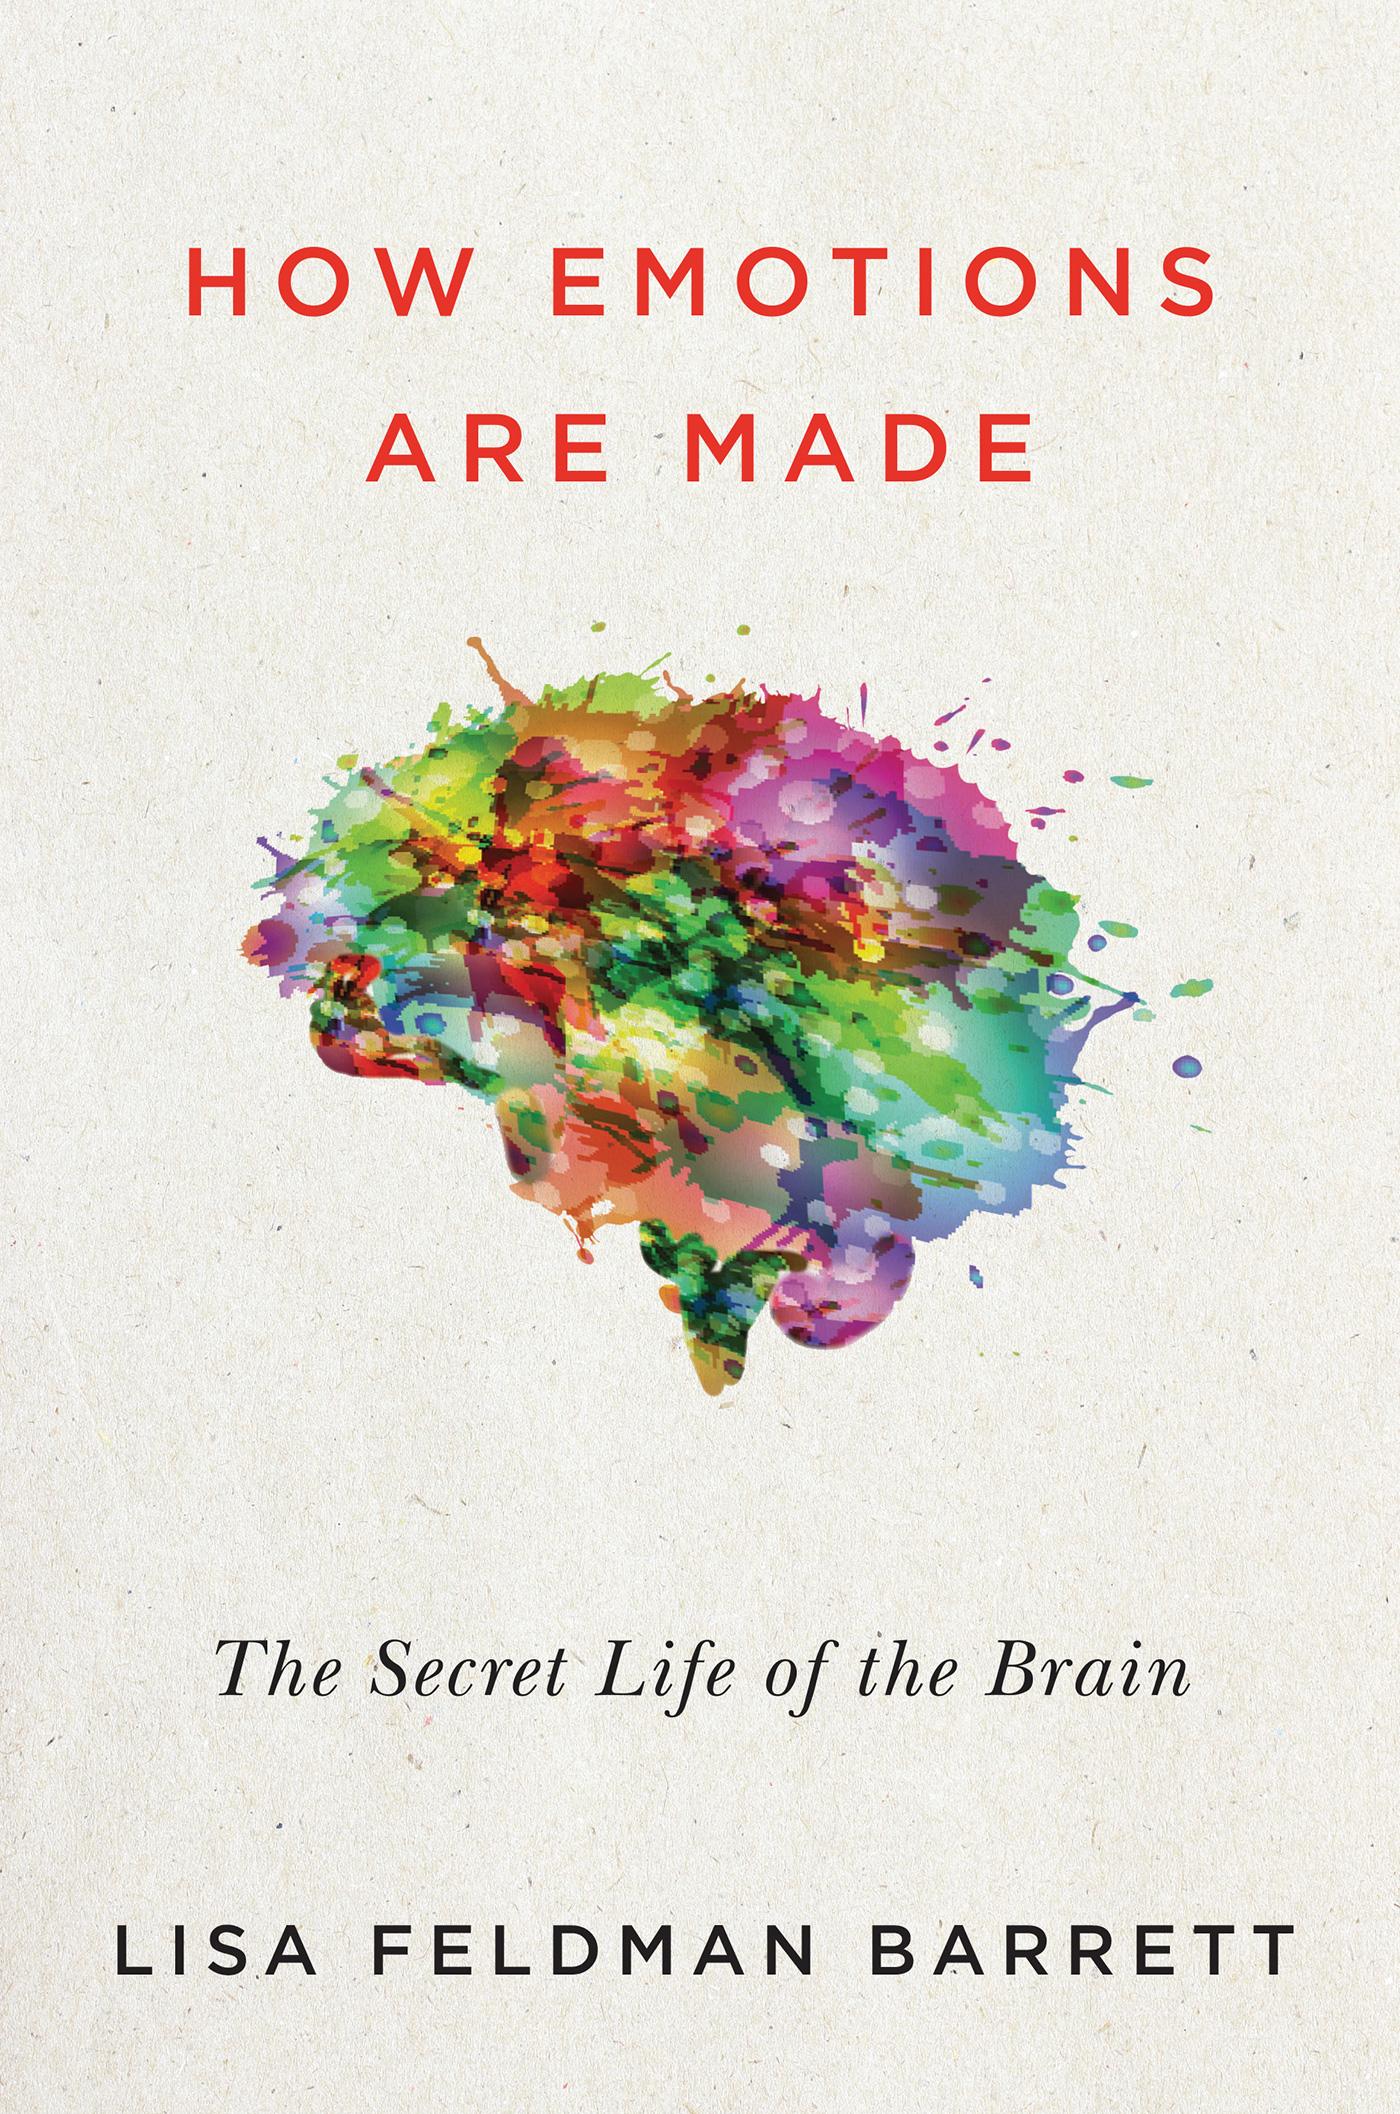 How Emotions Are Made: The Secret Life Of The Brain  by Lisa Feldman Barrett